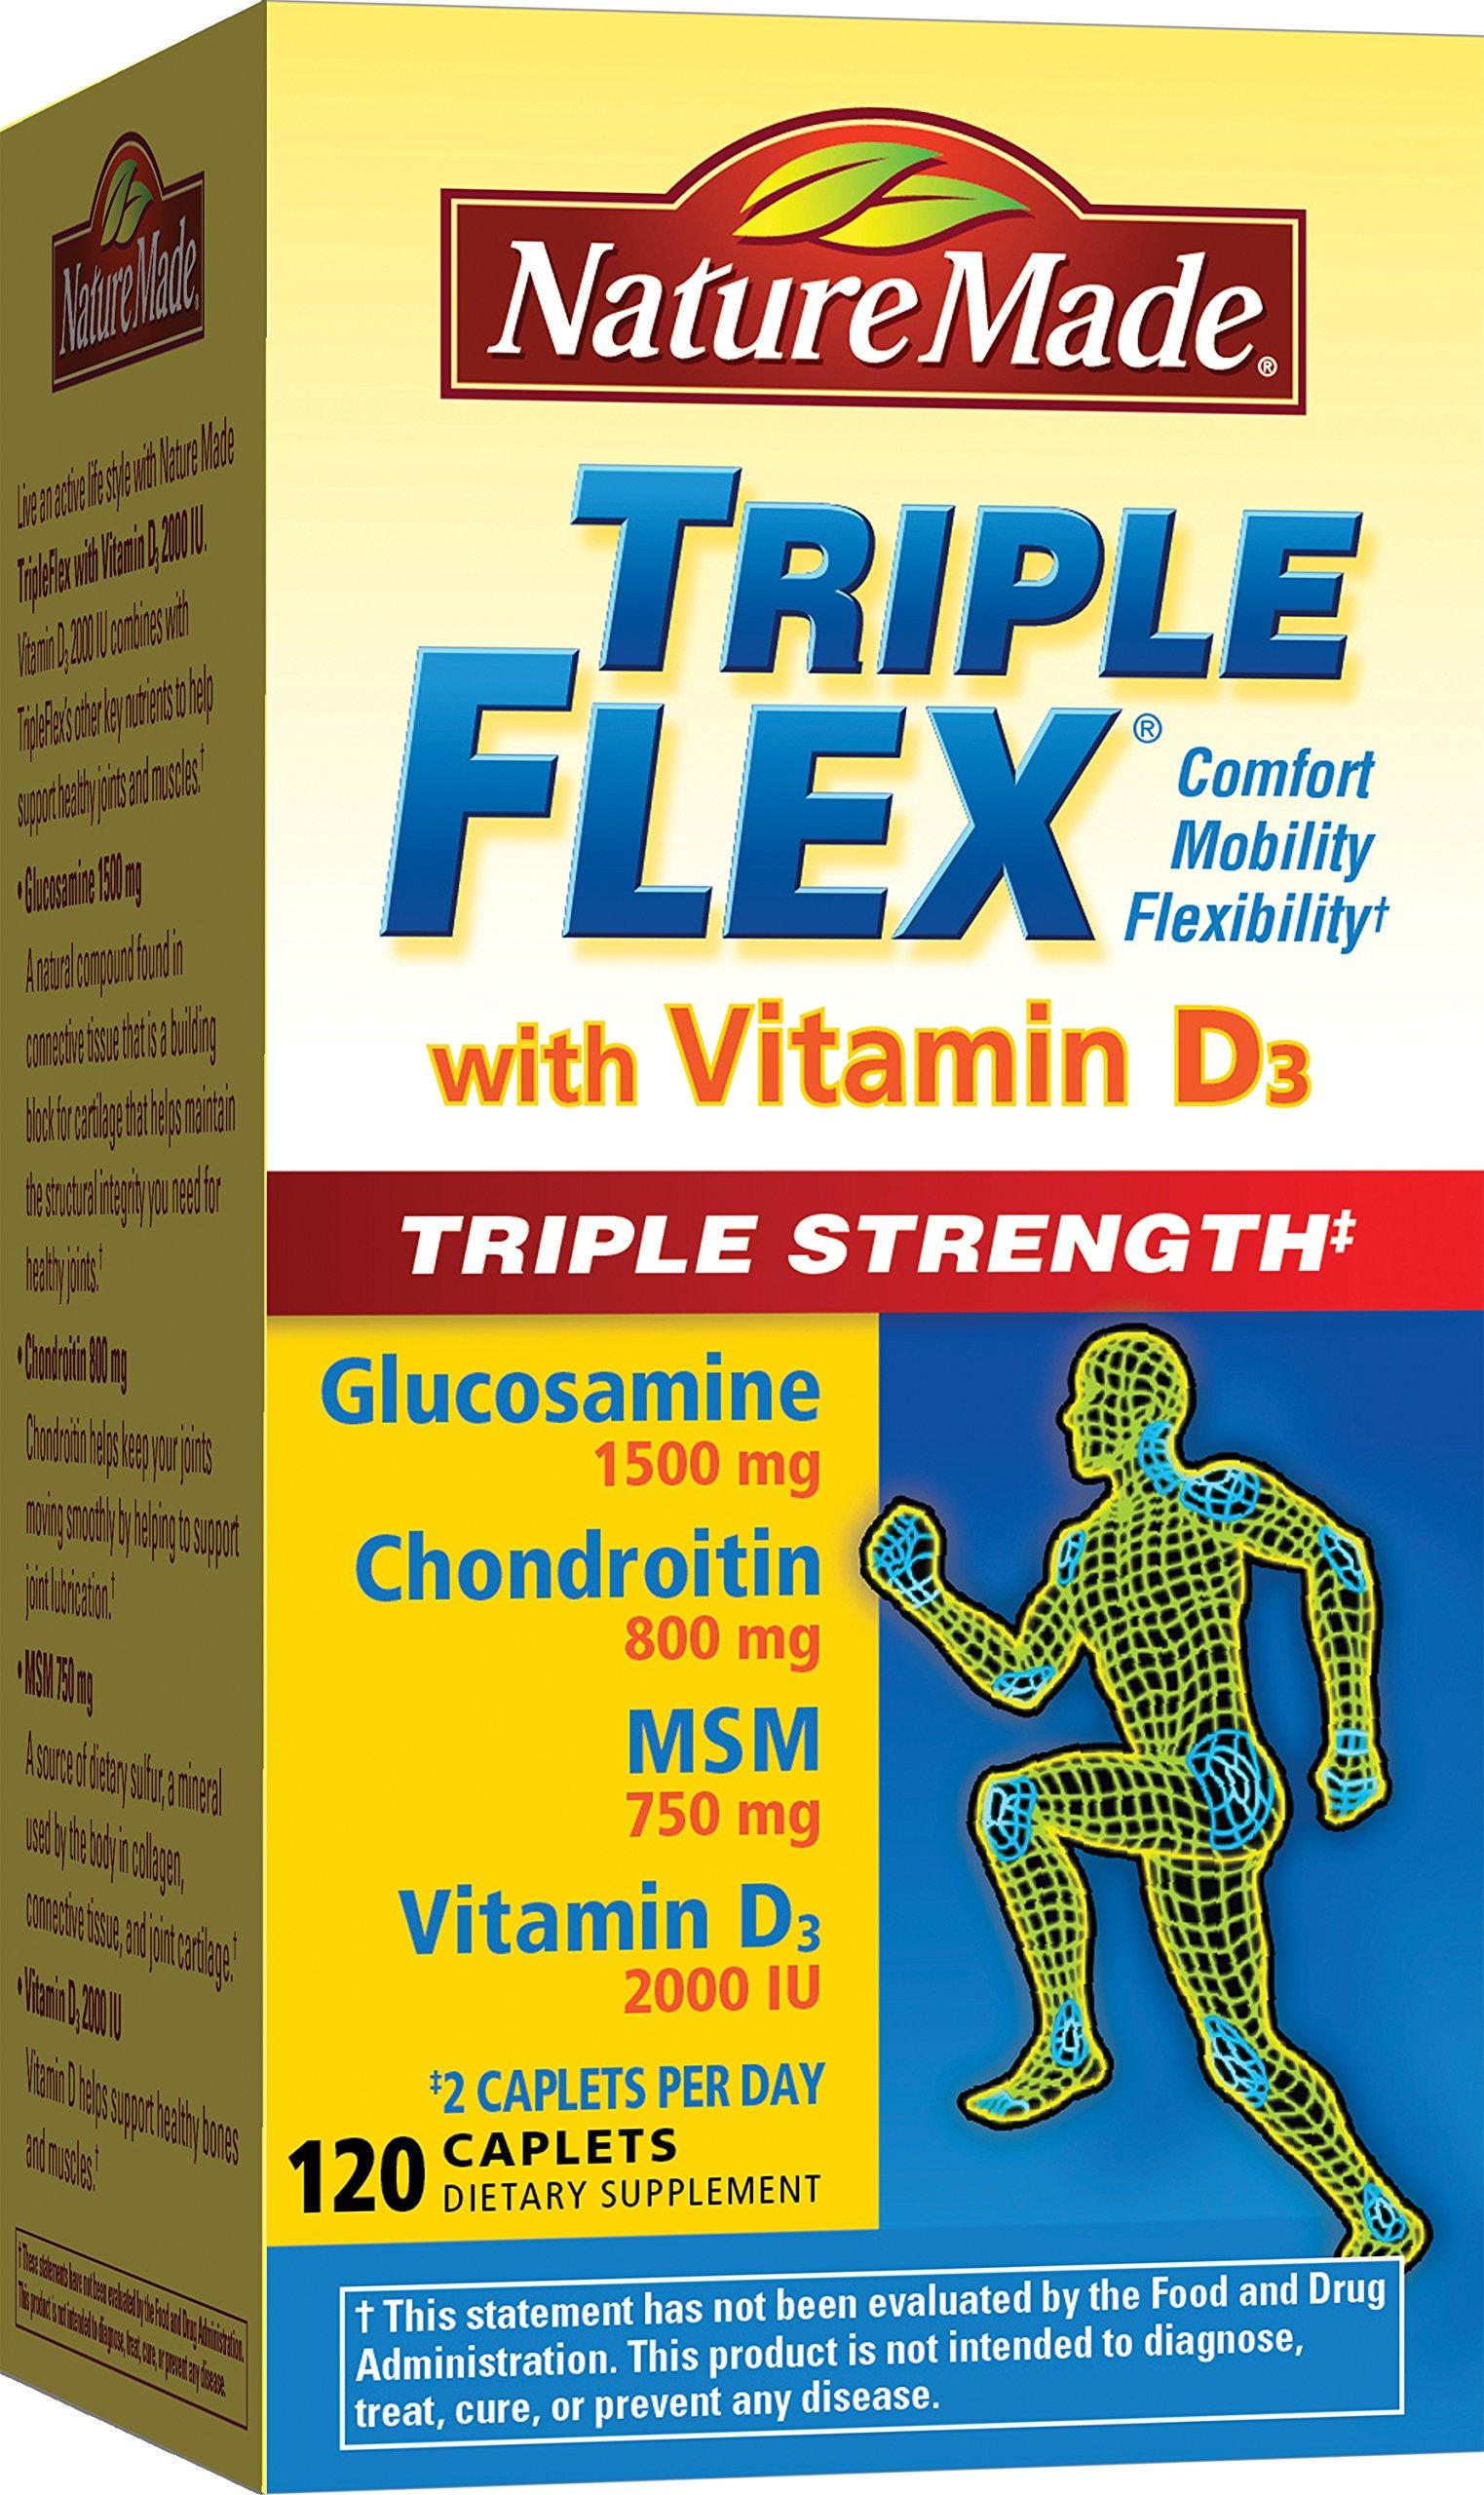 Nature Made TripleFlex Triple Strength with Vitamin D3 Caplet (Glucosamine Chondroitin MSM)  120 ct